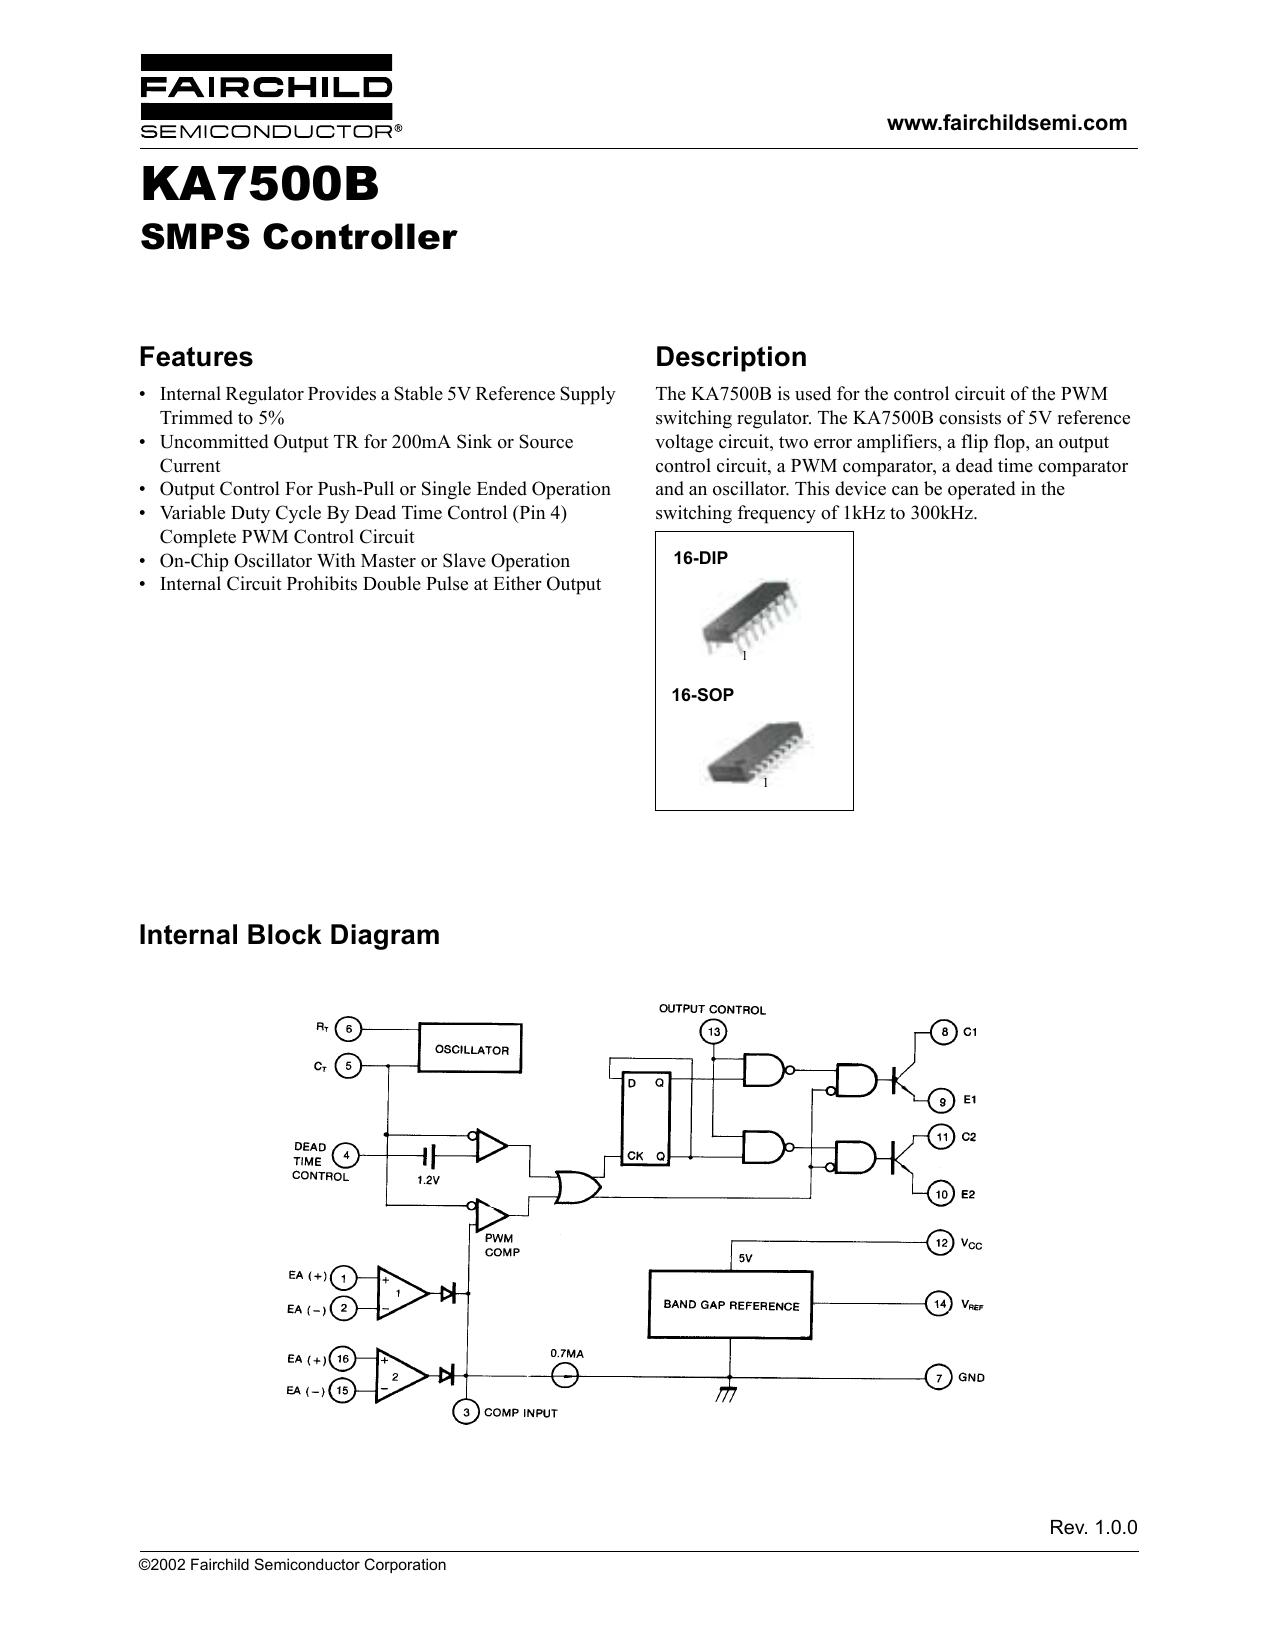 Ka7500b Smps Controller Pwm Amplifier Circuit 018530798 1 D16efa46c12acee44add6f59a431cc8b